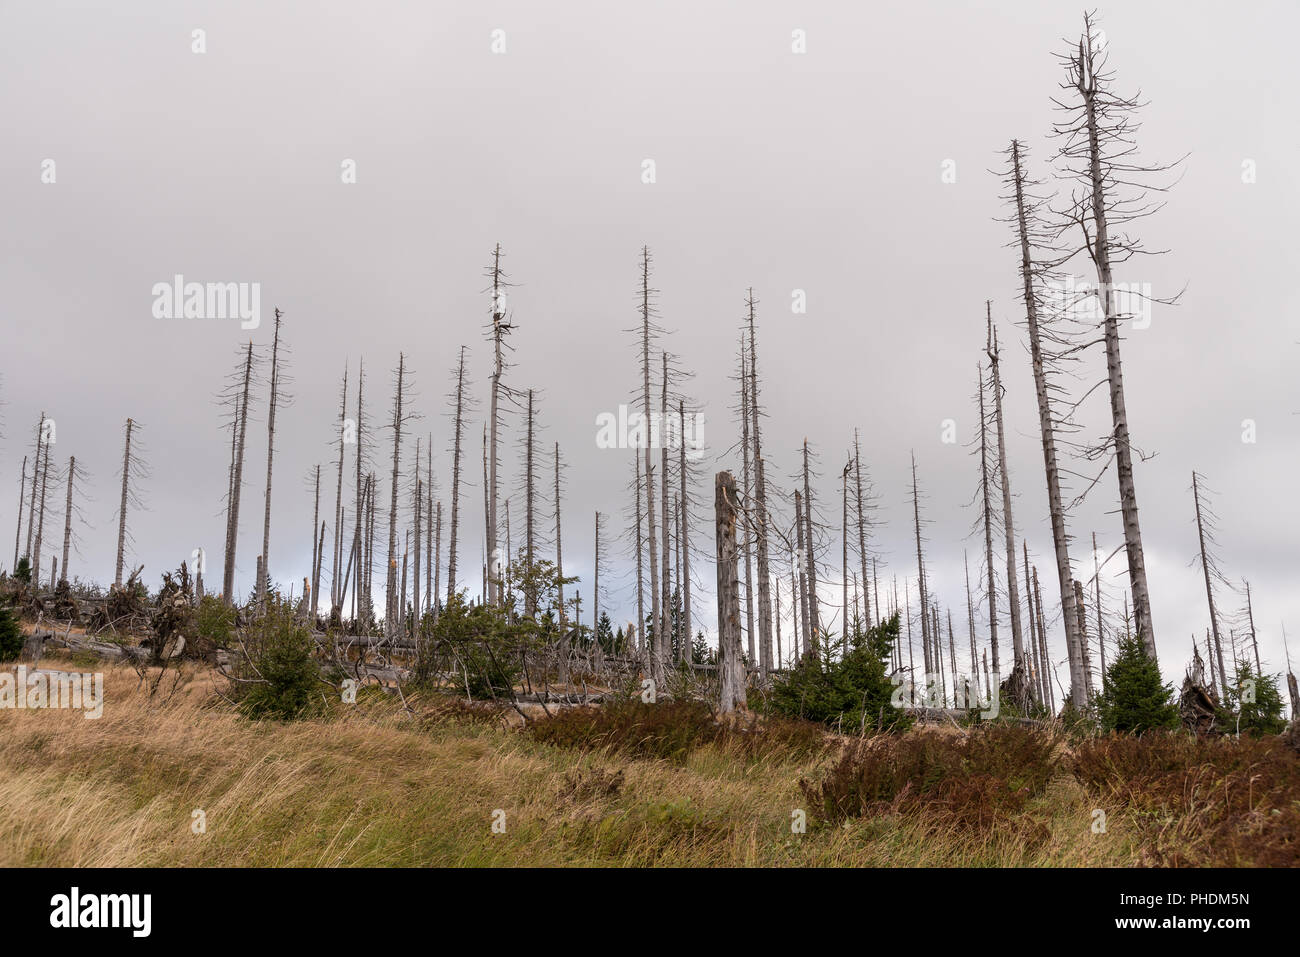 Bald trees after bark beetle infestation - Bohemian forest - Stock Image